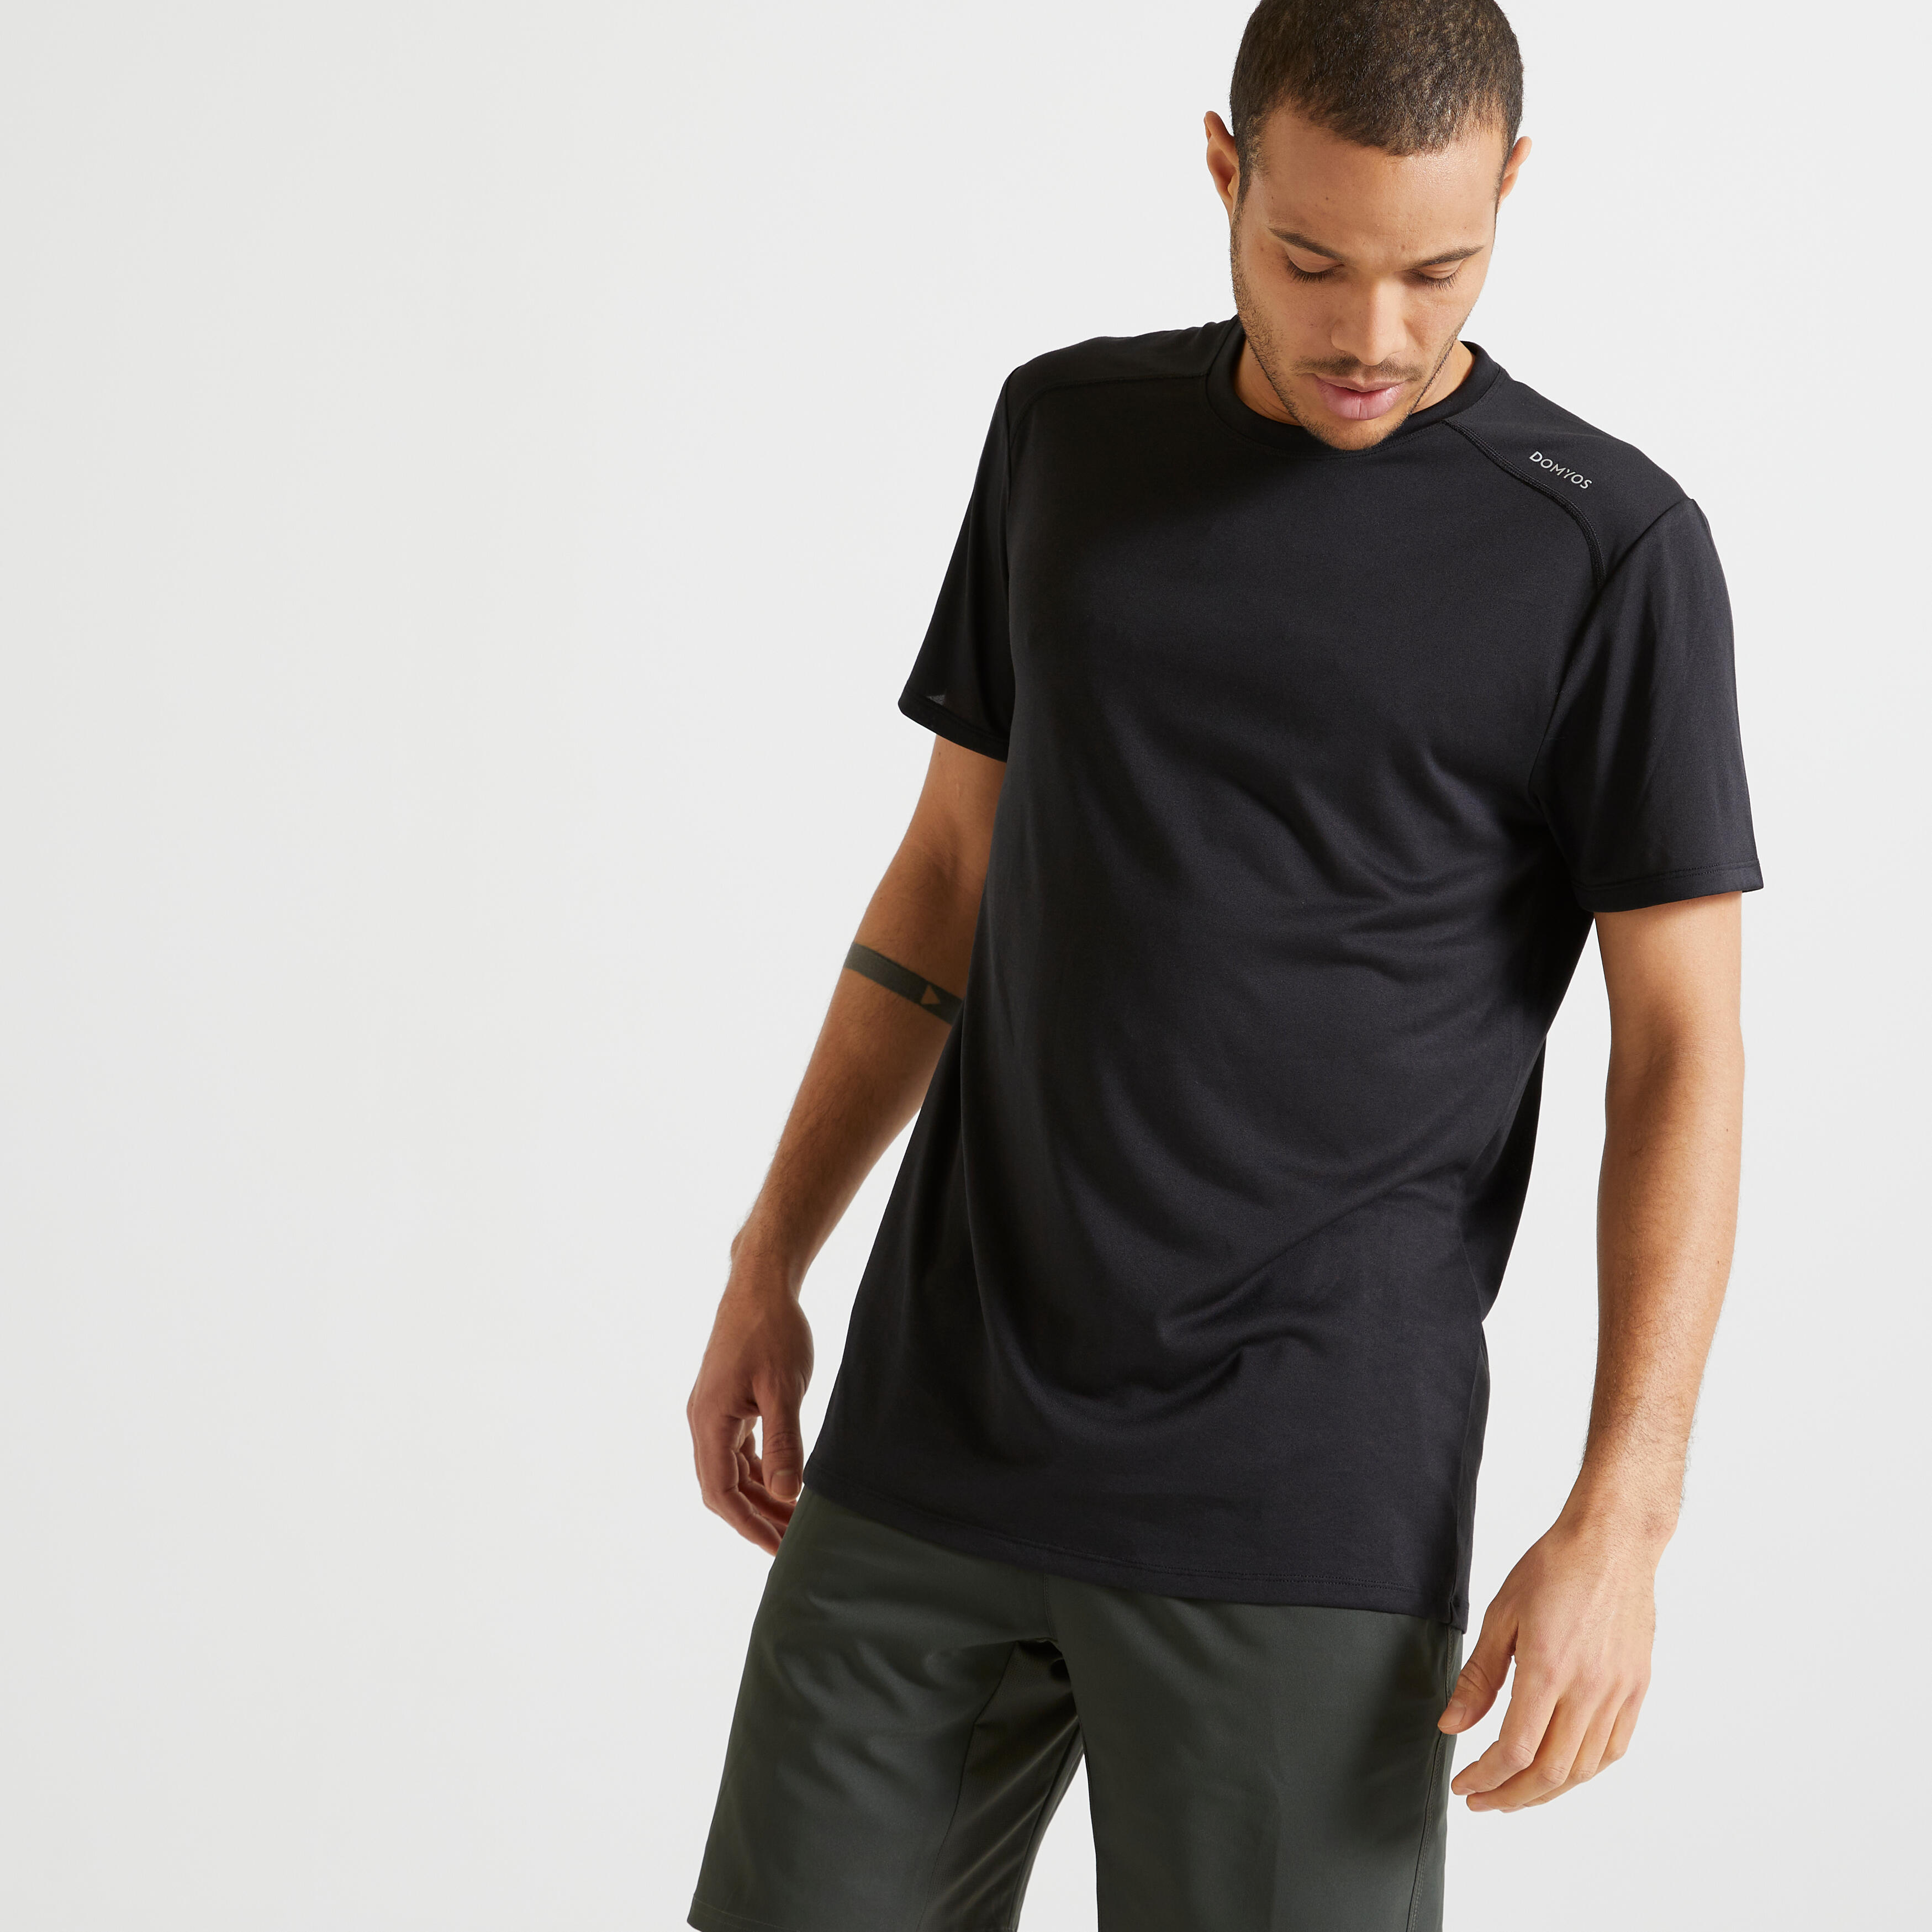 Tricou Fitness 100 Negru la Reducere poza